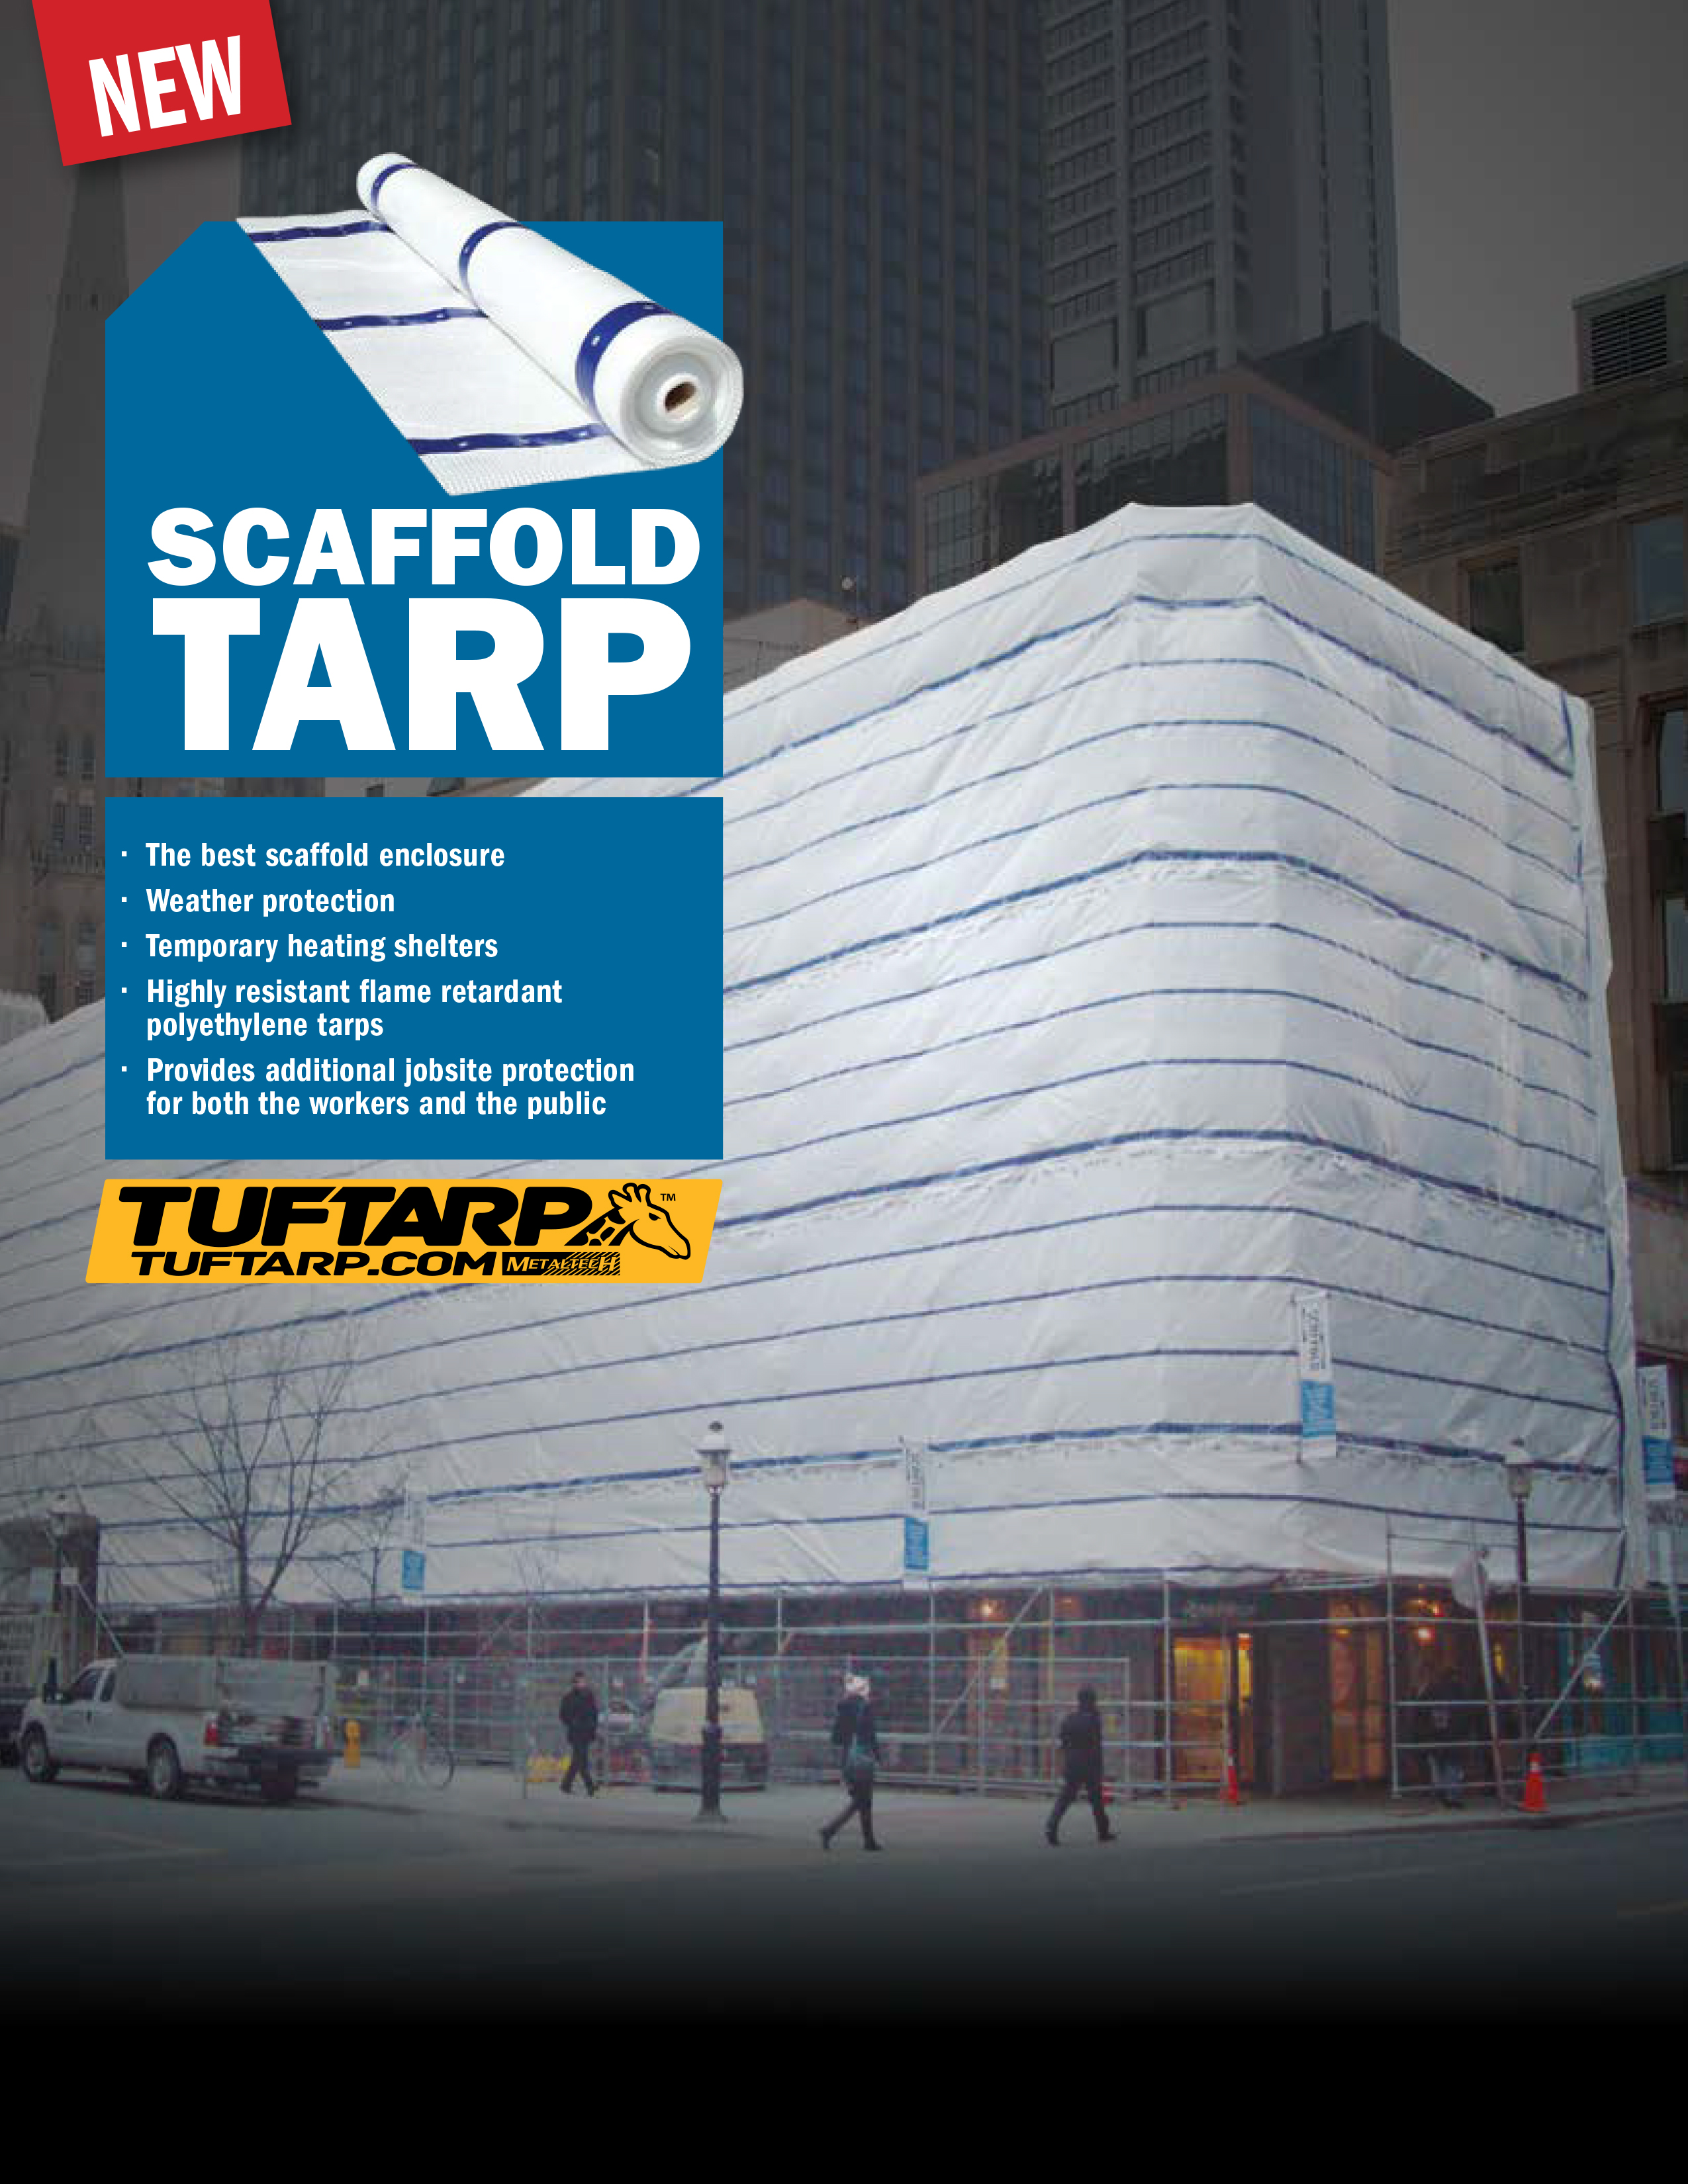 metaltech-scaffold-tarp-1.jpg